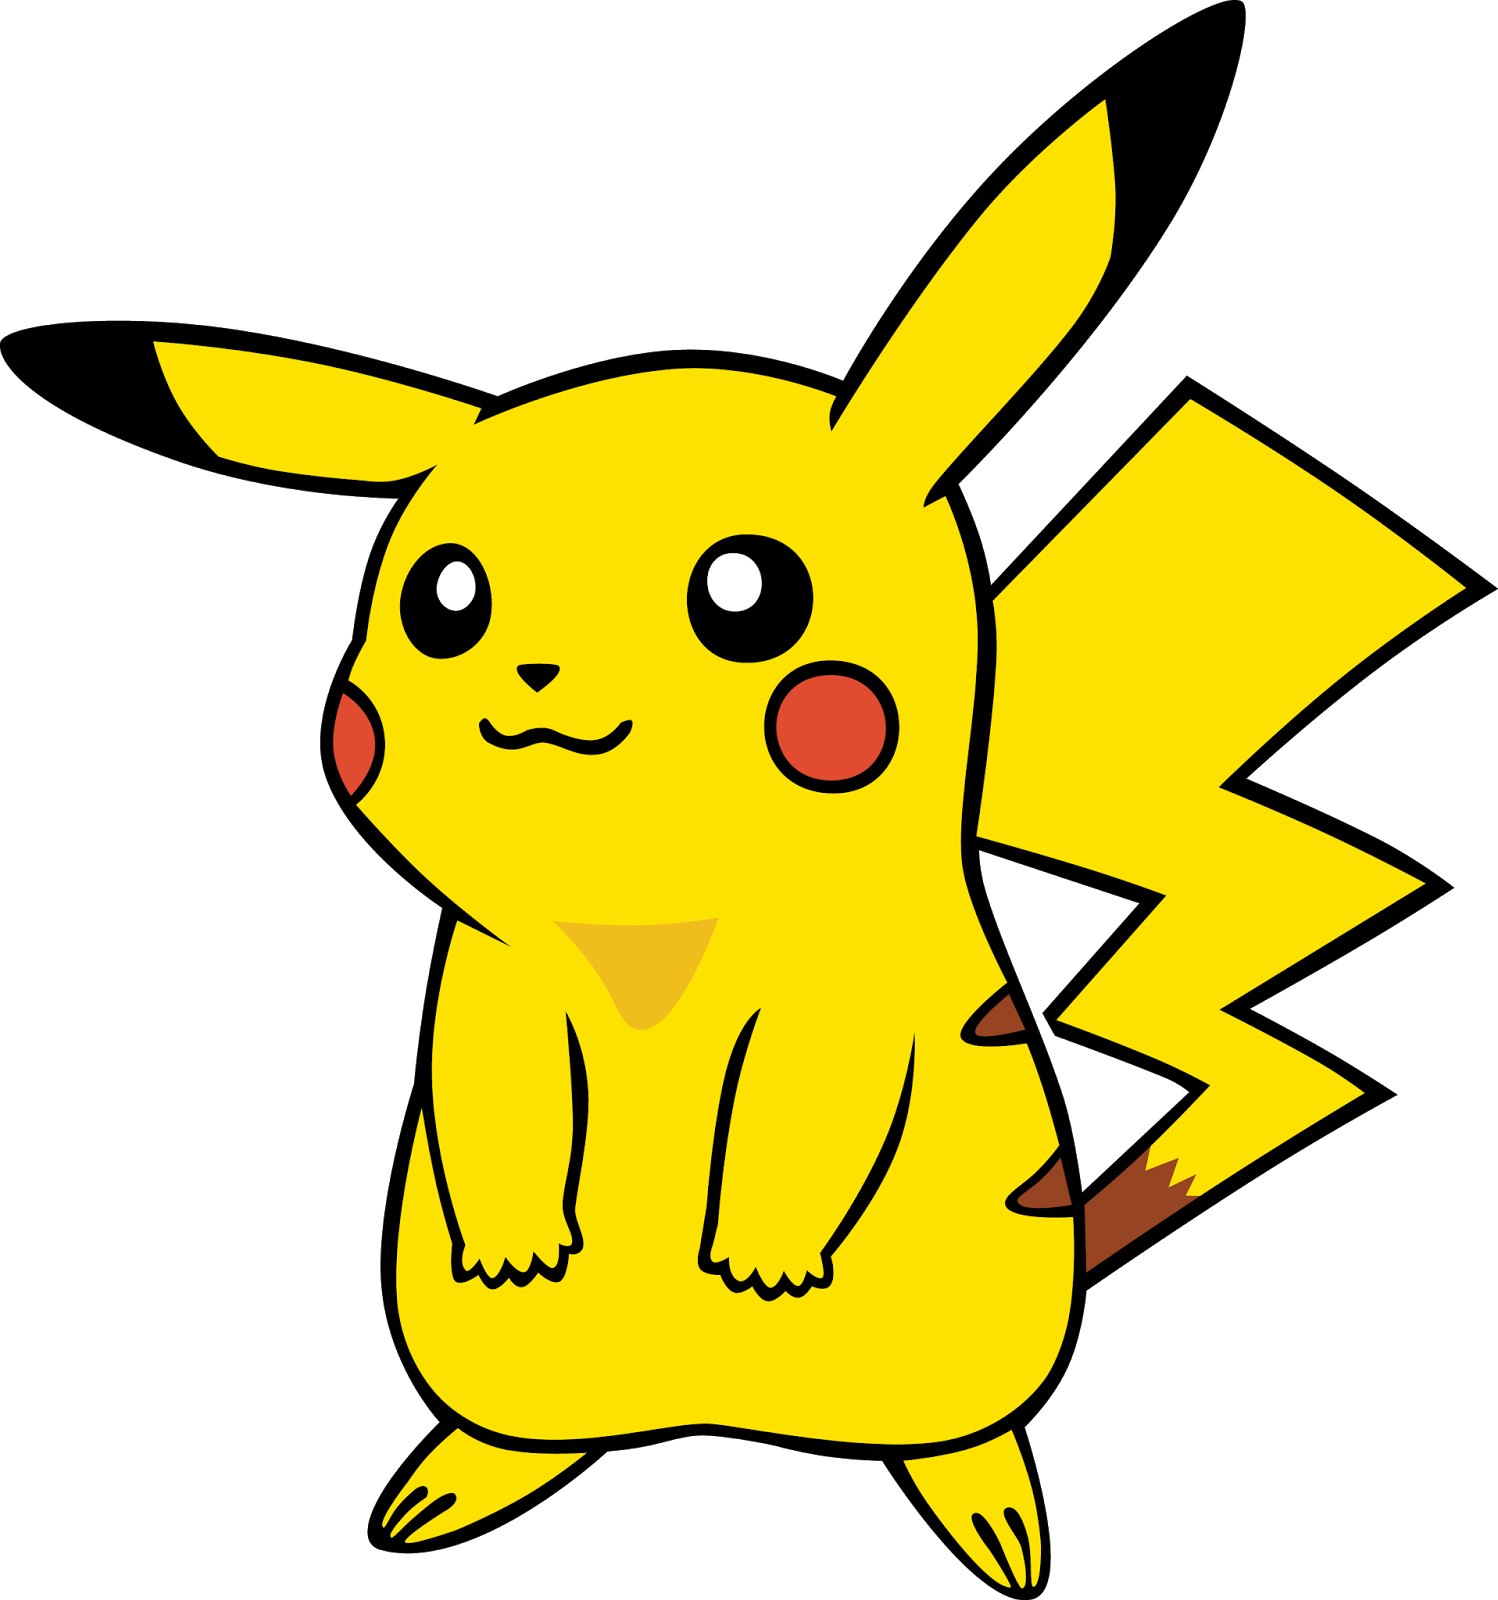 Go galeria de imagens. Pokemon clipart template